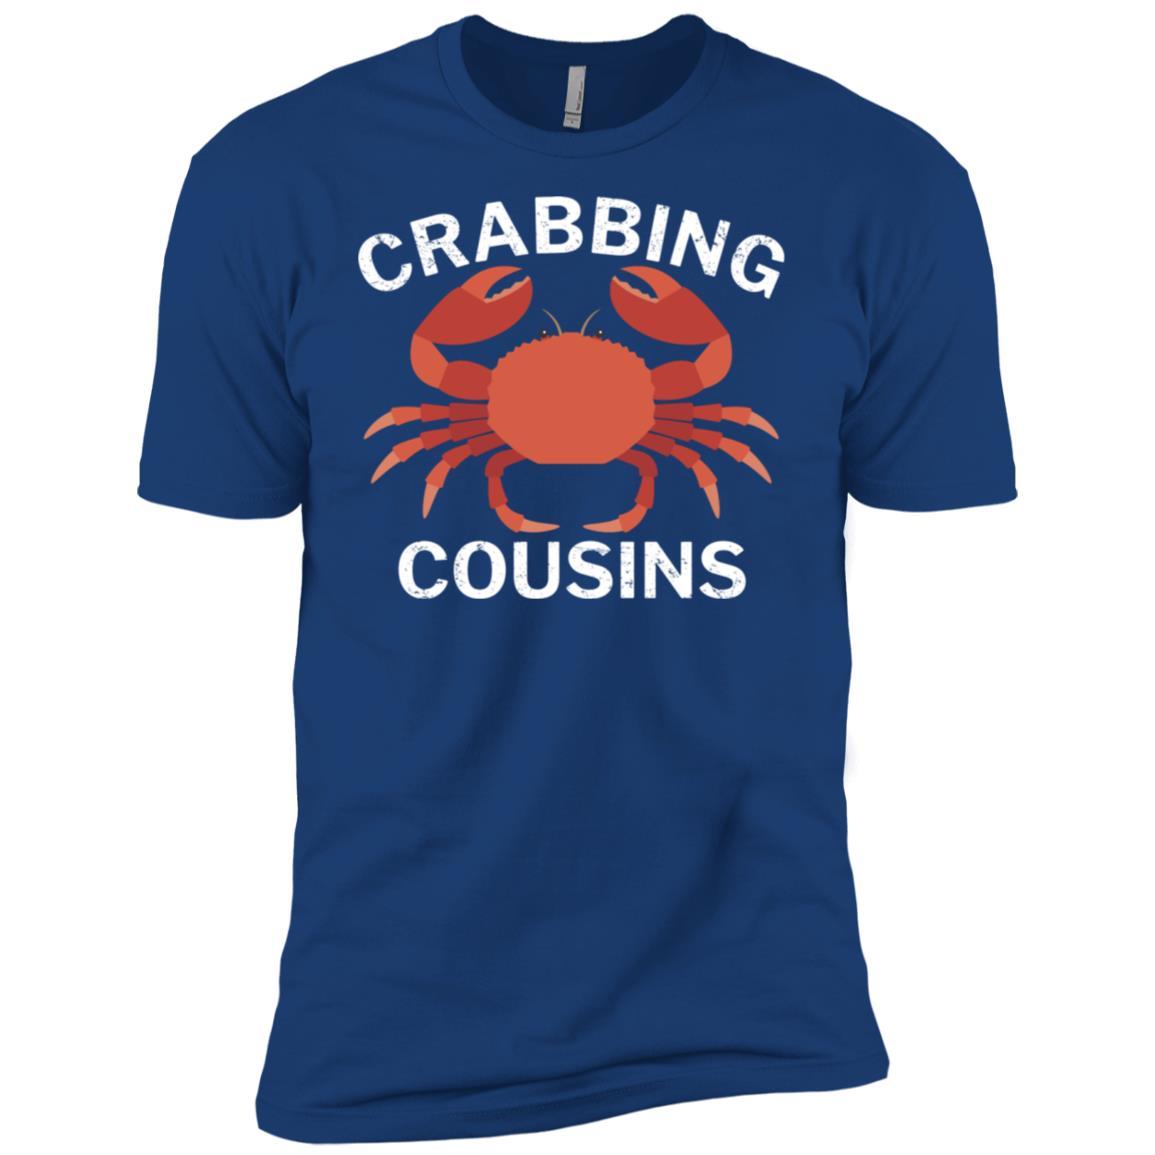 Crabbing Cousins Funny Fishing Men Short Sleeve T-Shirt